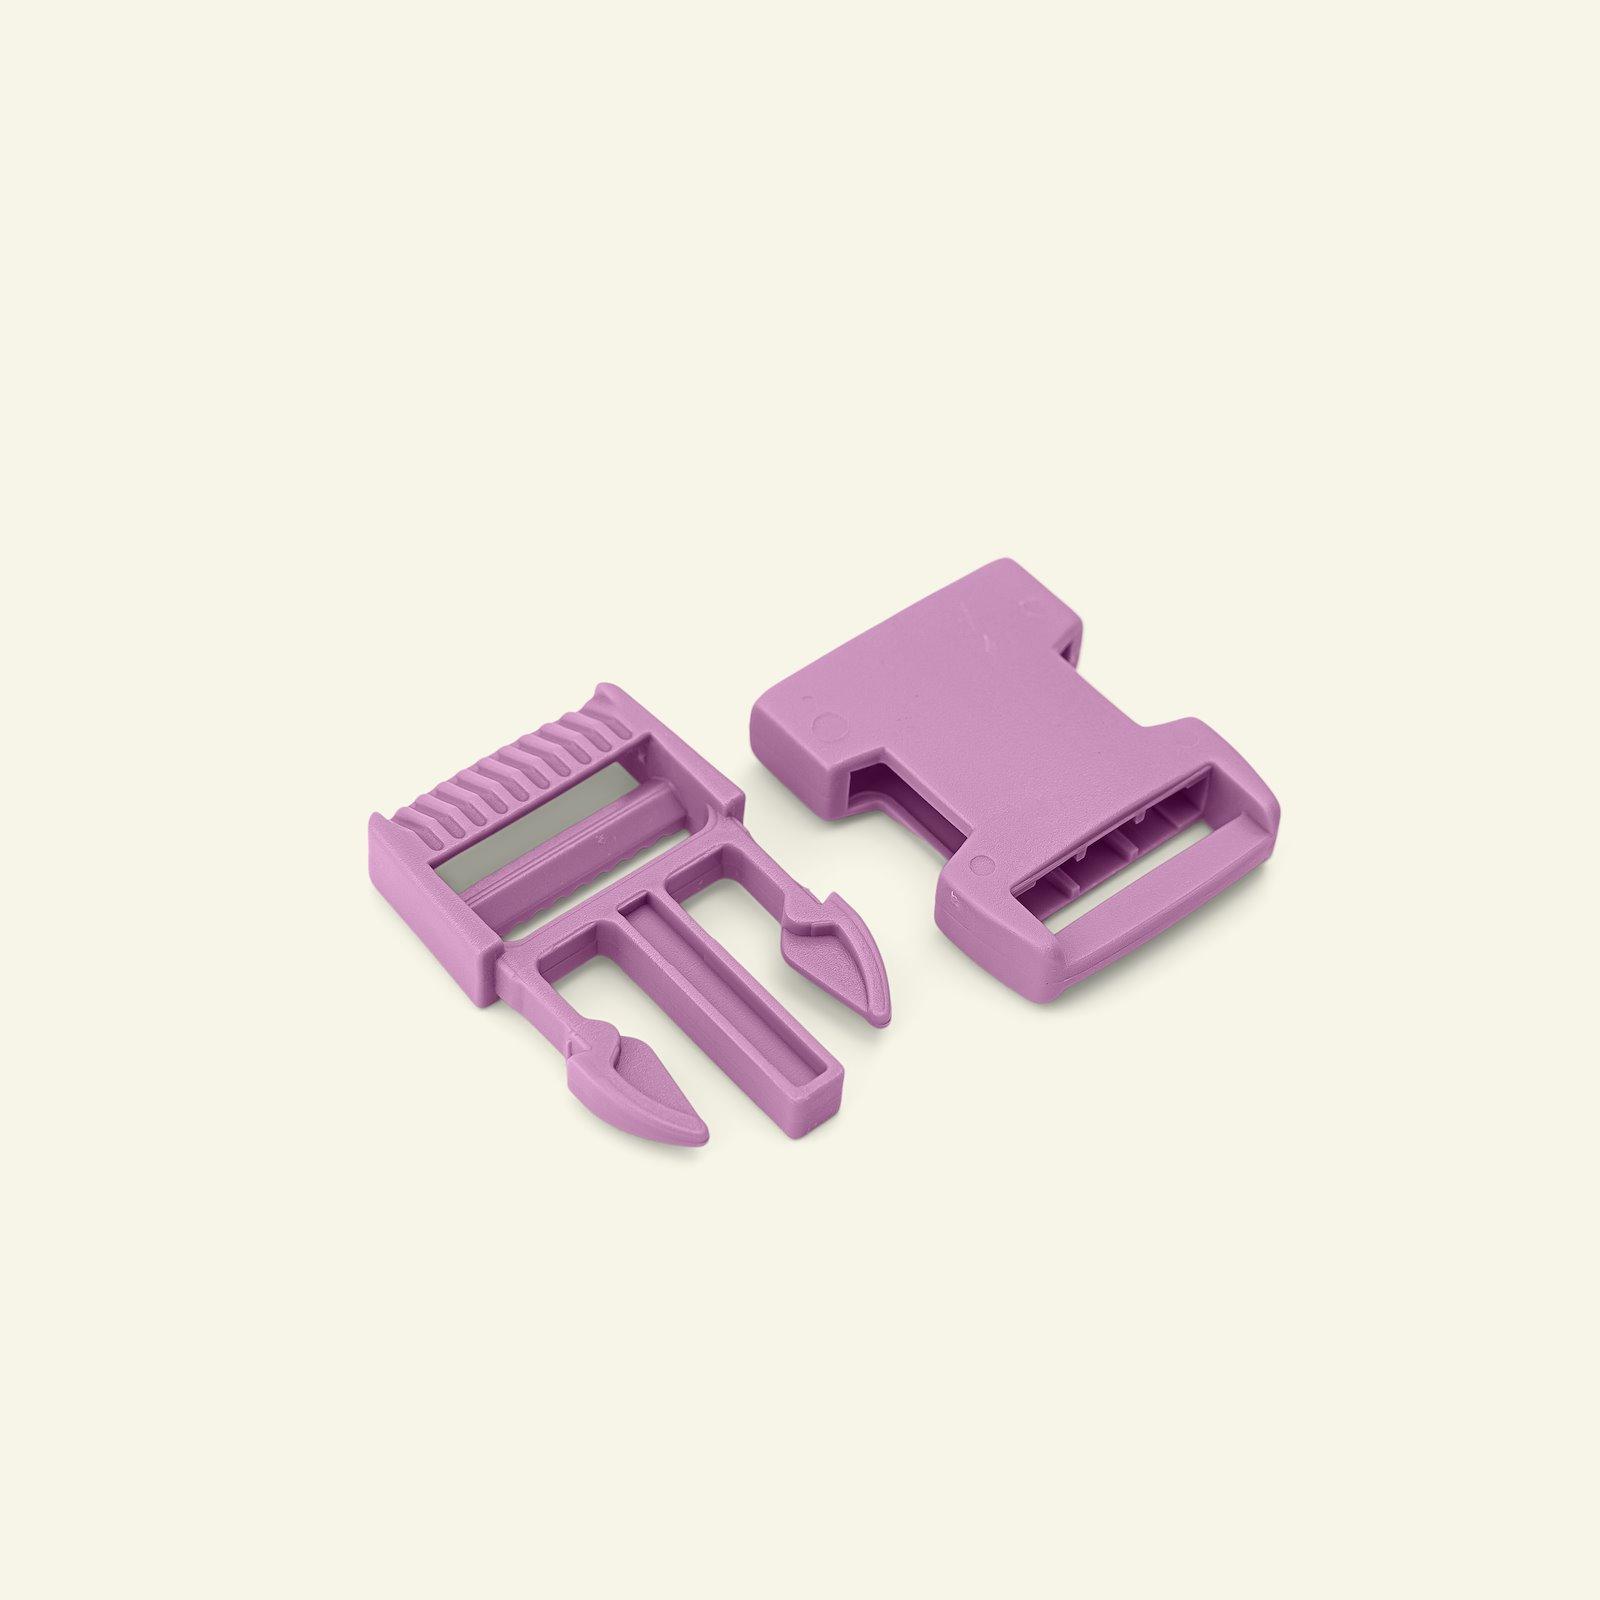 Belt buckle 25mm dusty violet 1pc 45201_pack